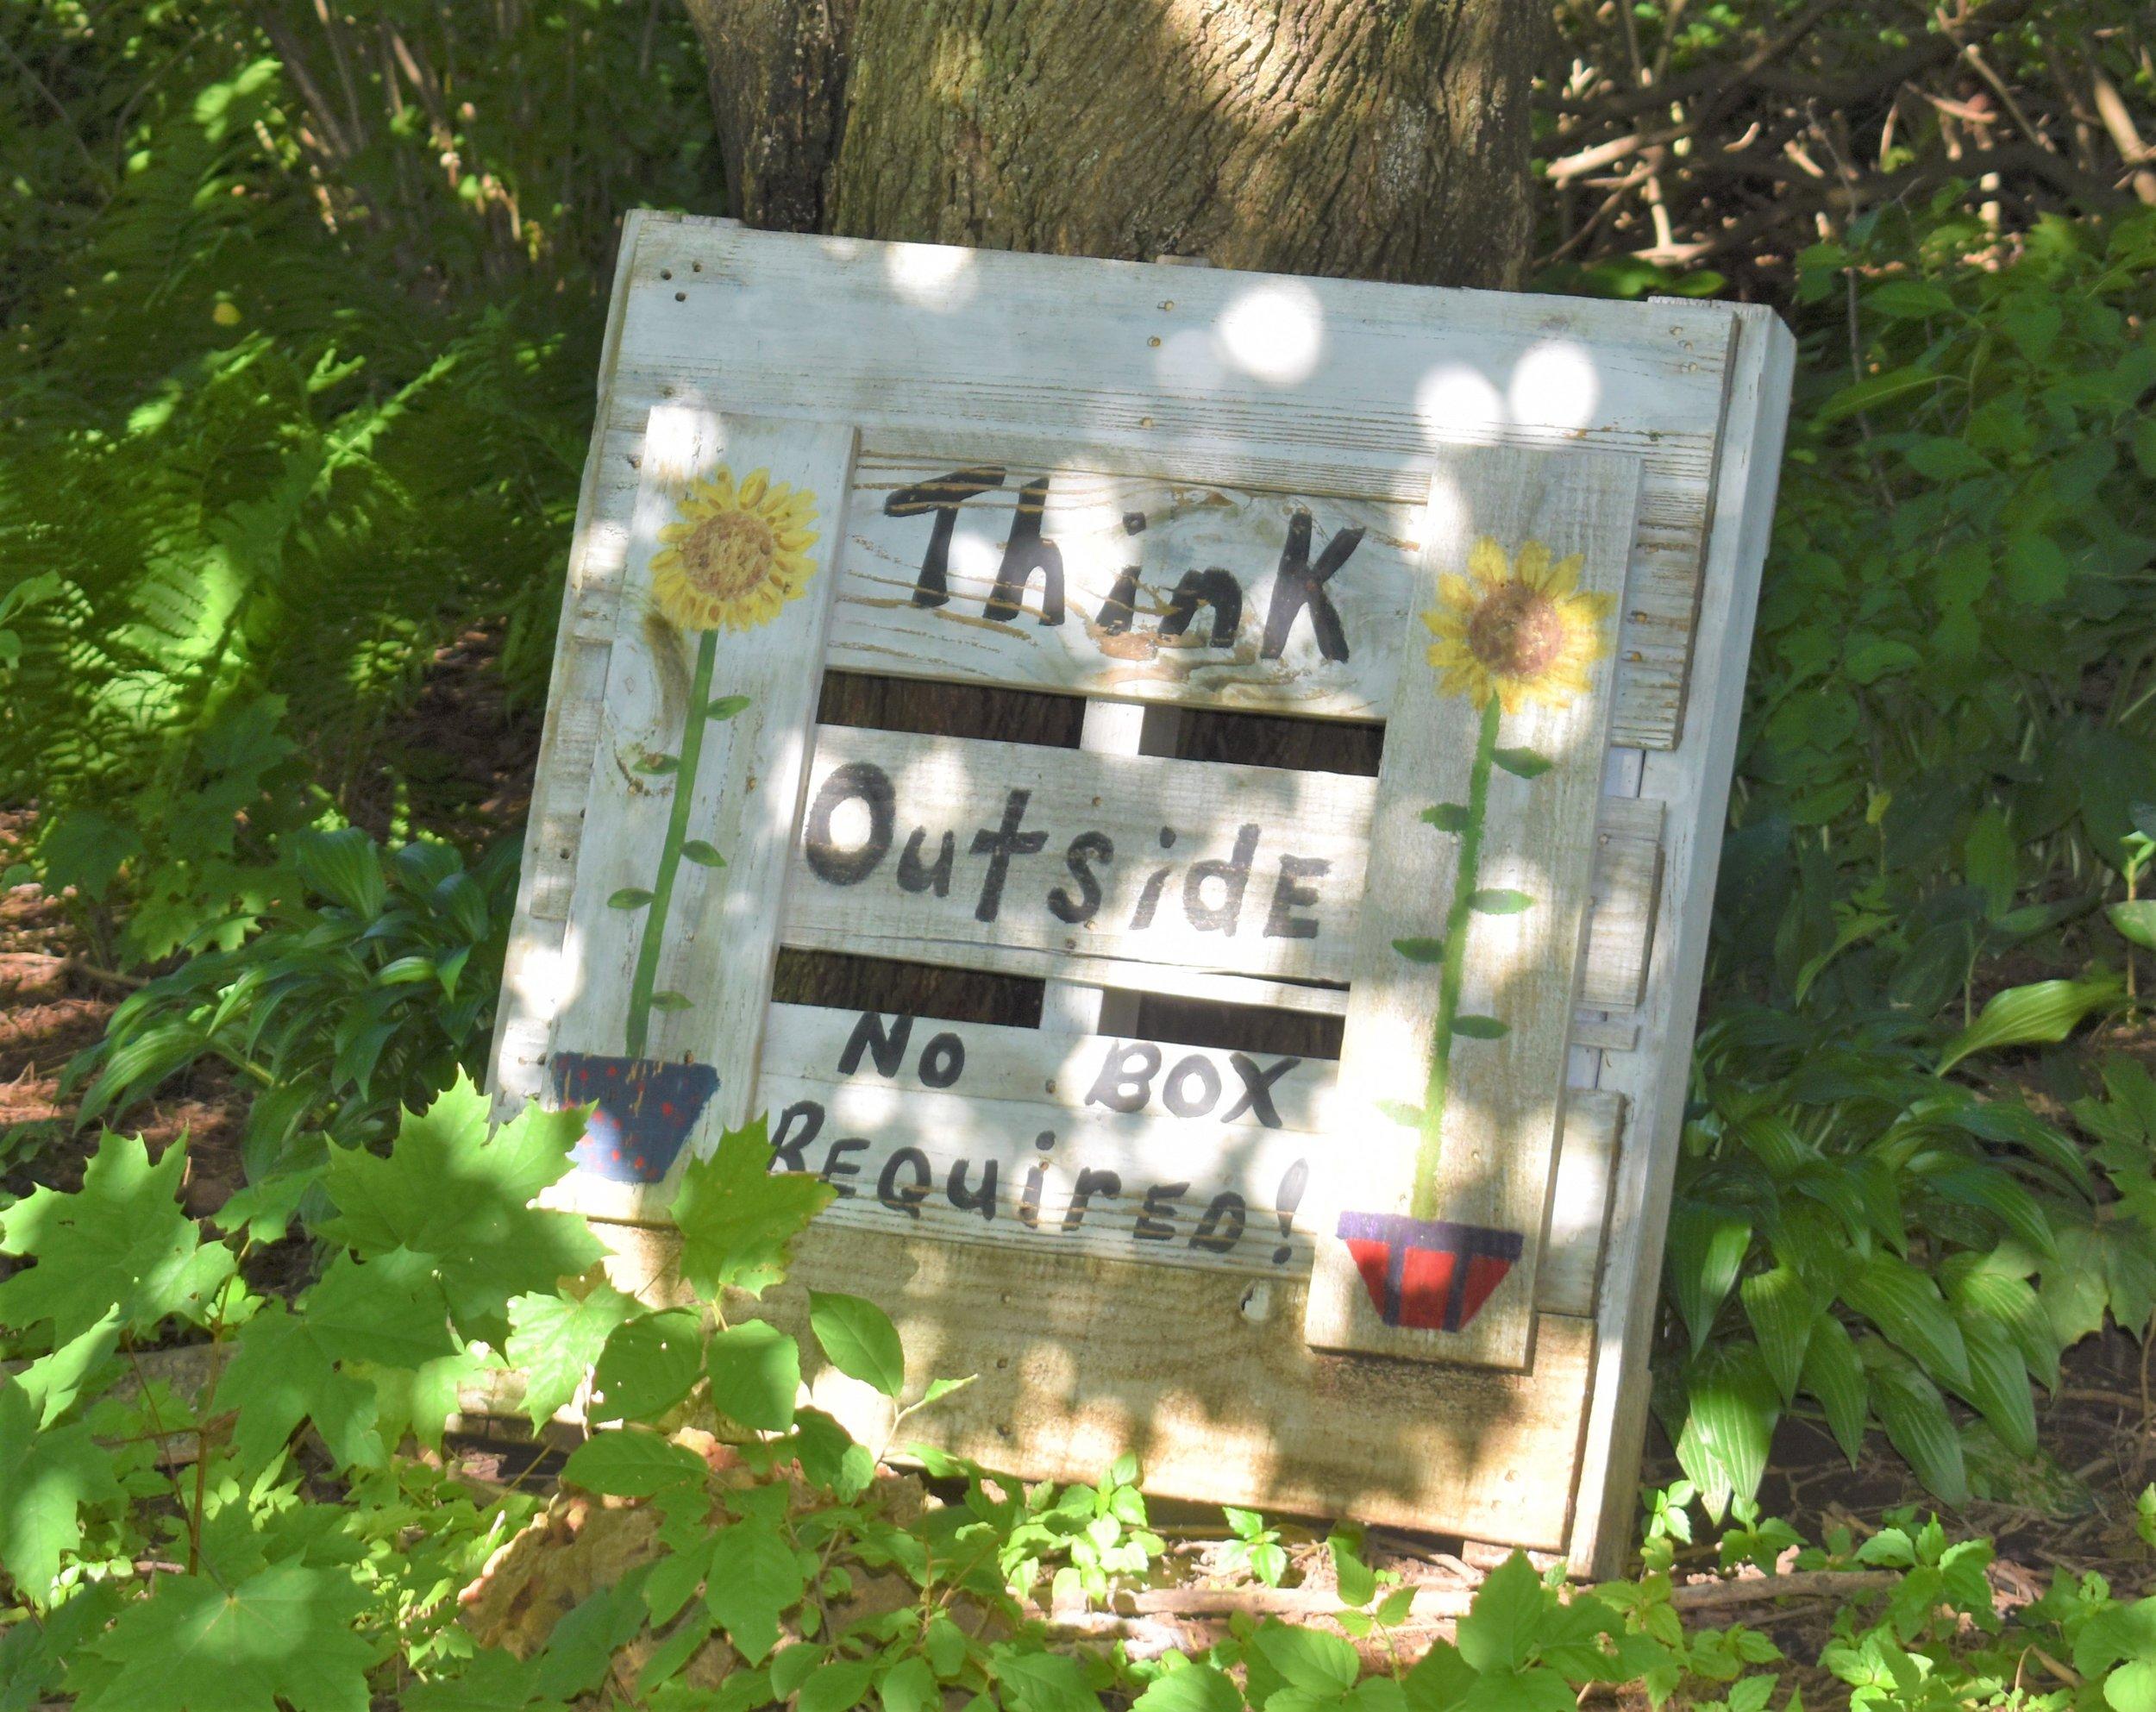 Maybe an unofficial motto at the Sebranek Farm?